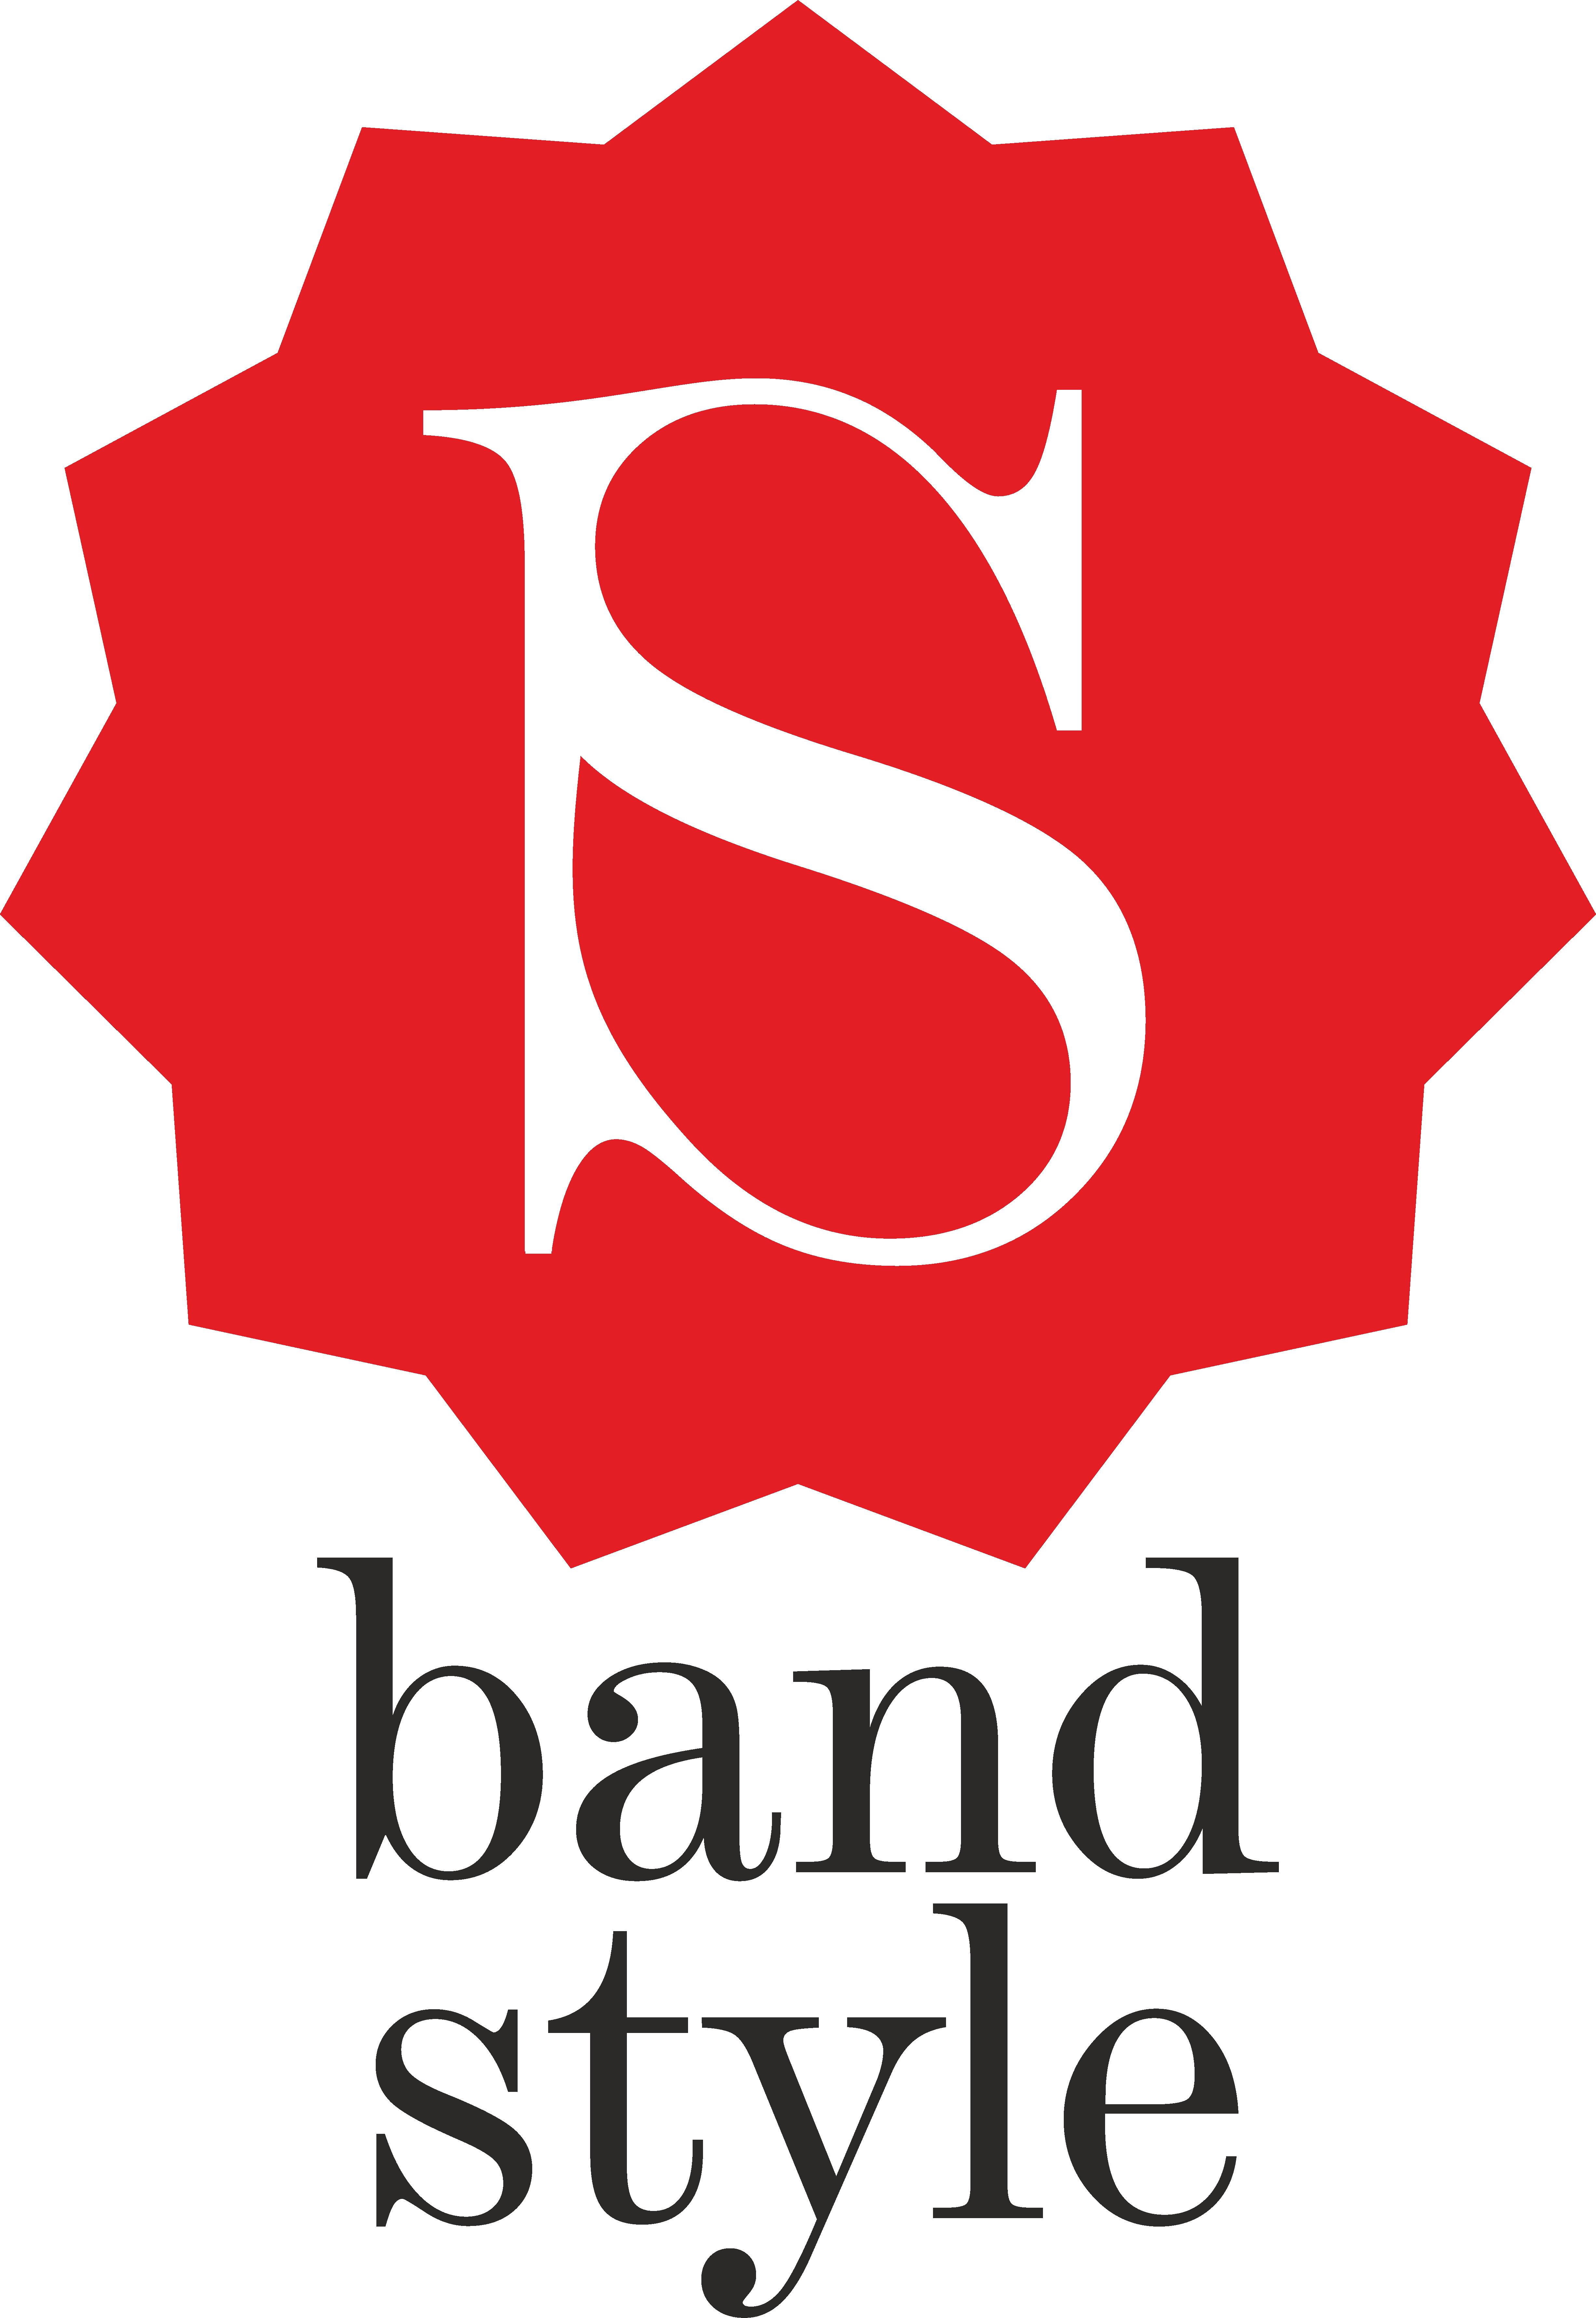 bandstyle